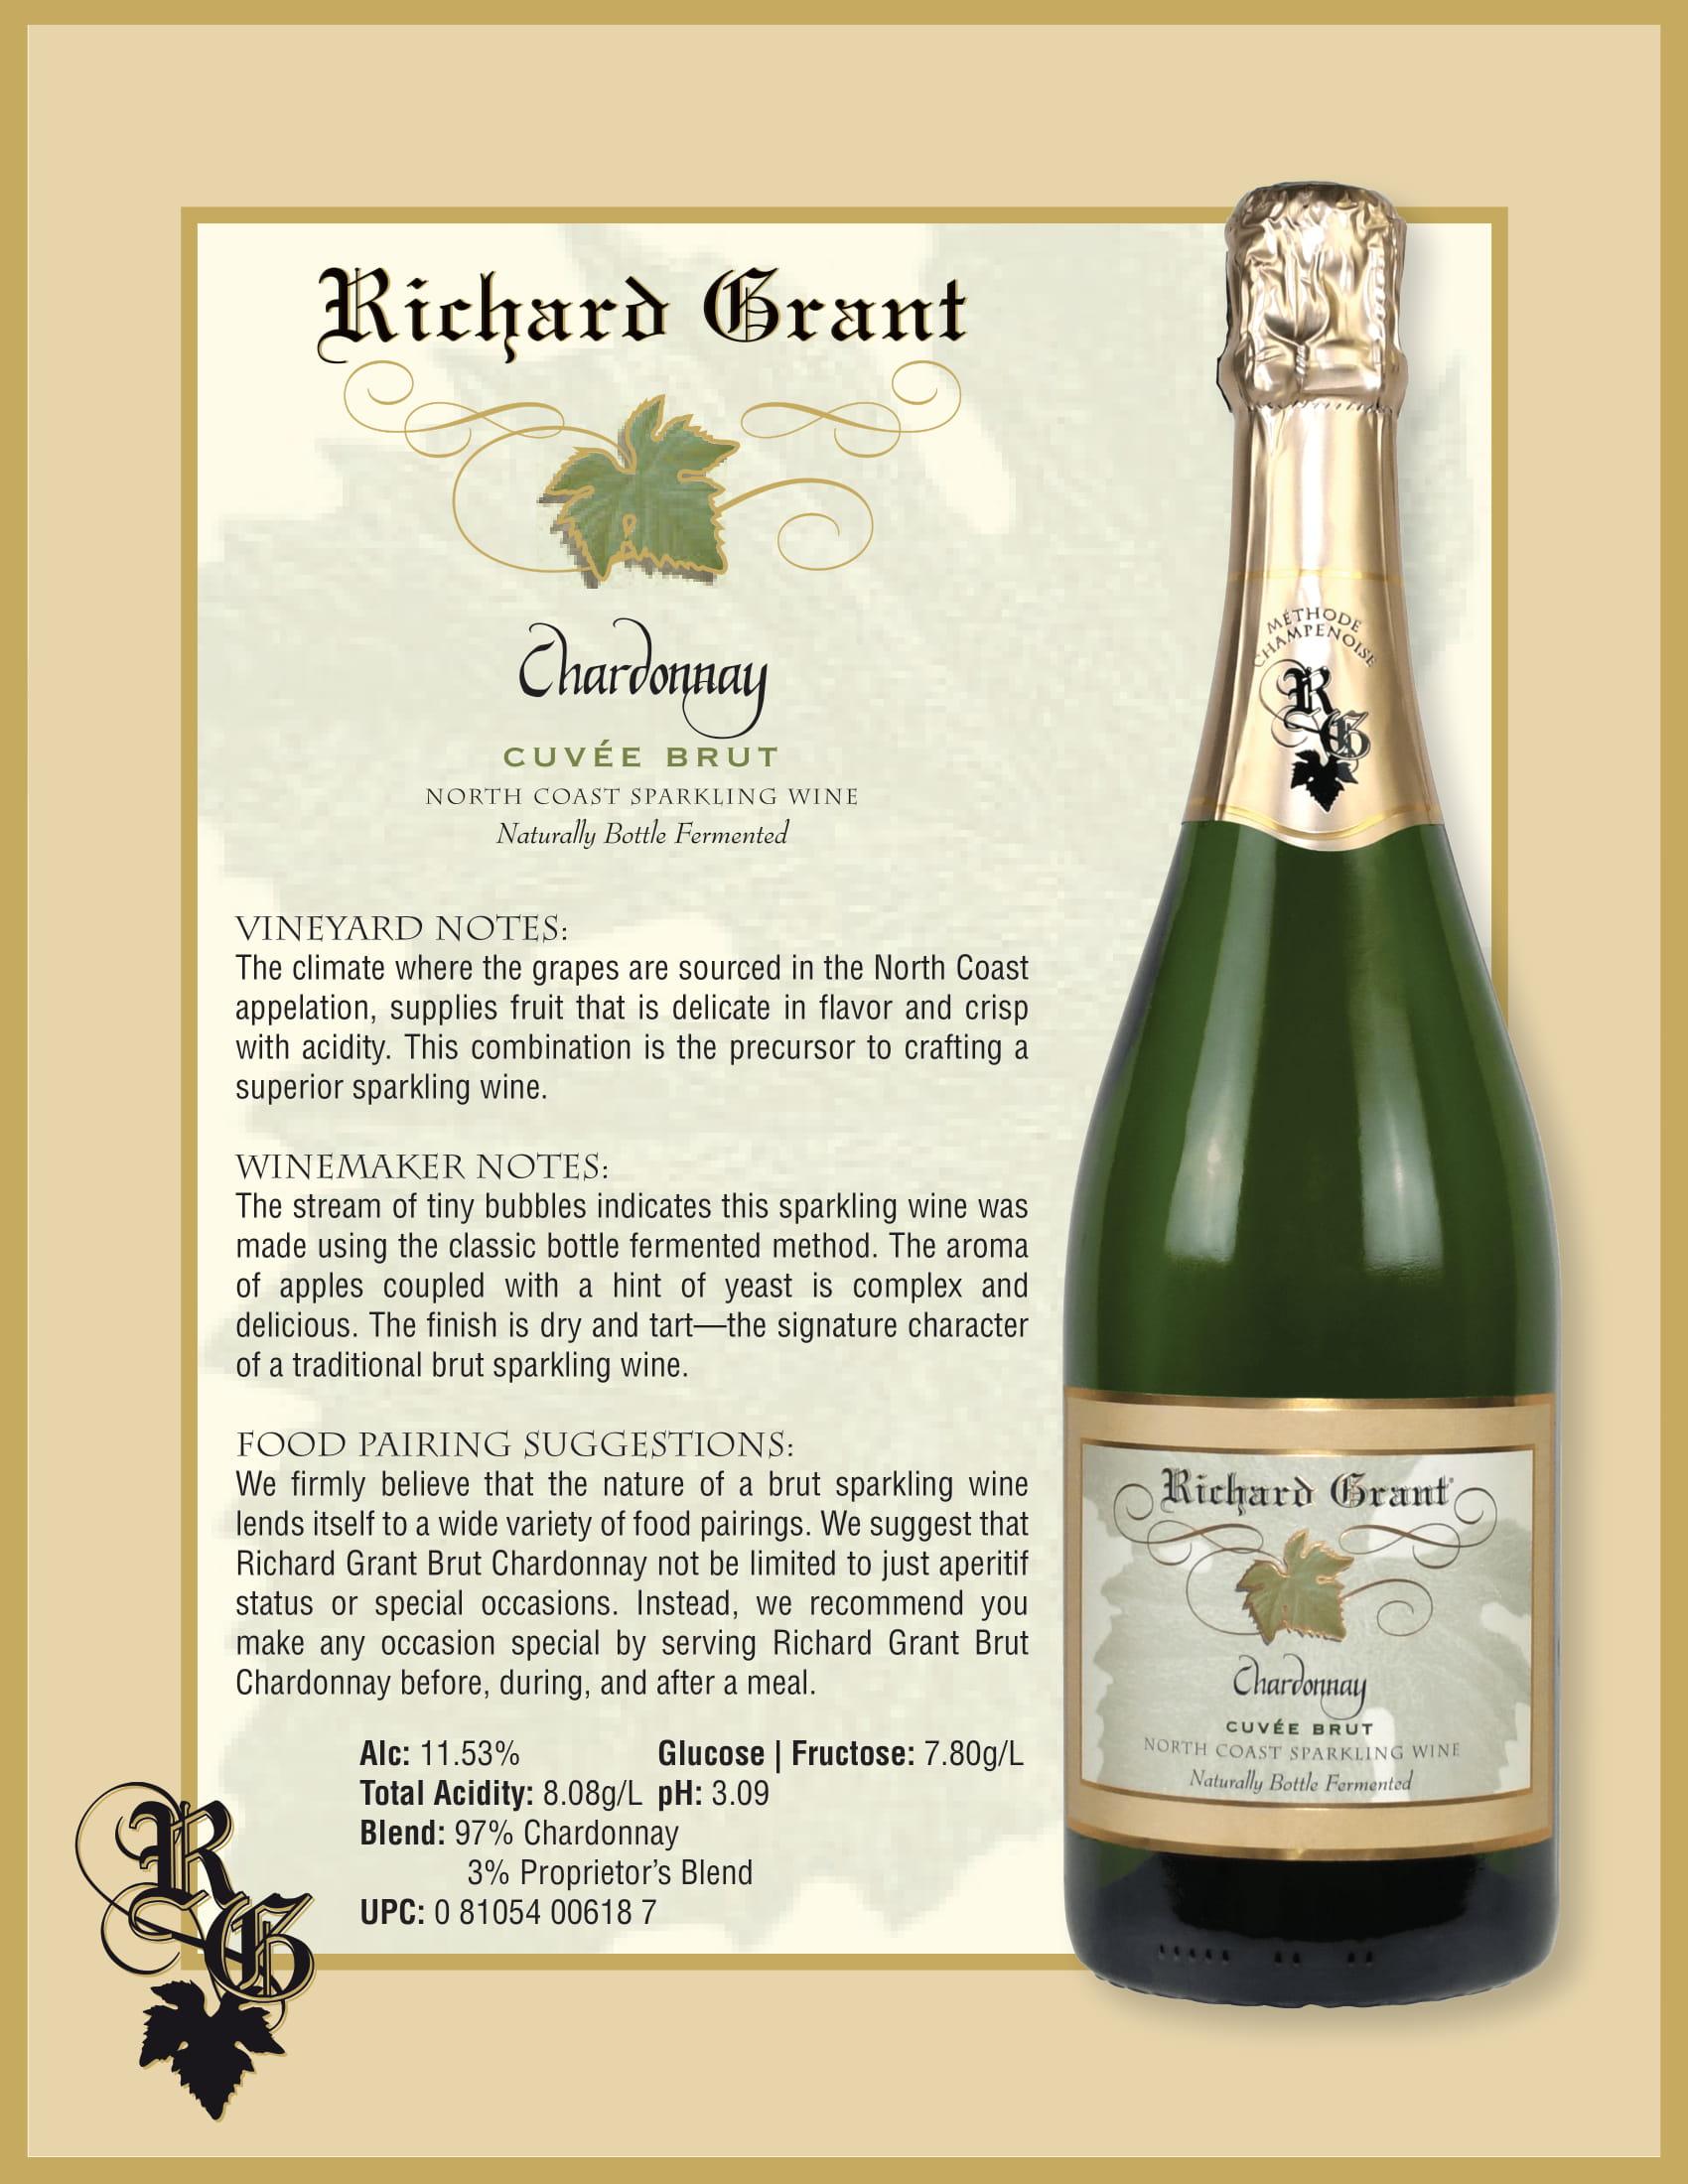 Richard Grant Chardonnay Cuvée Brut Tech Sheet